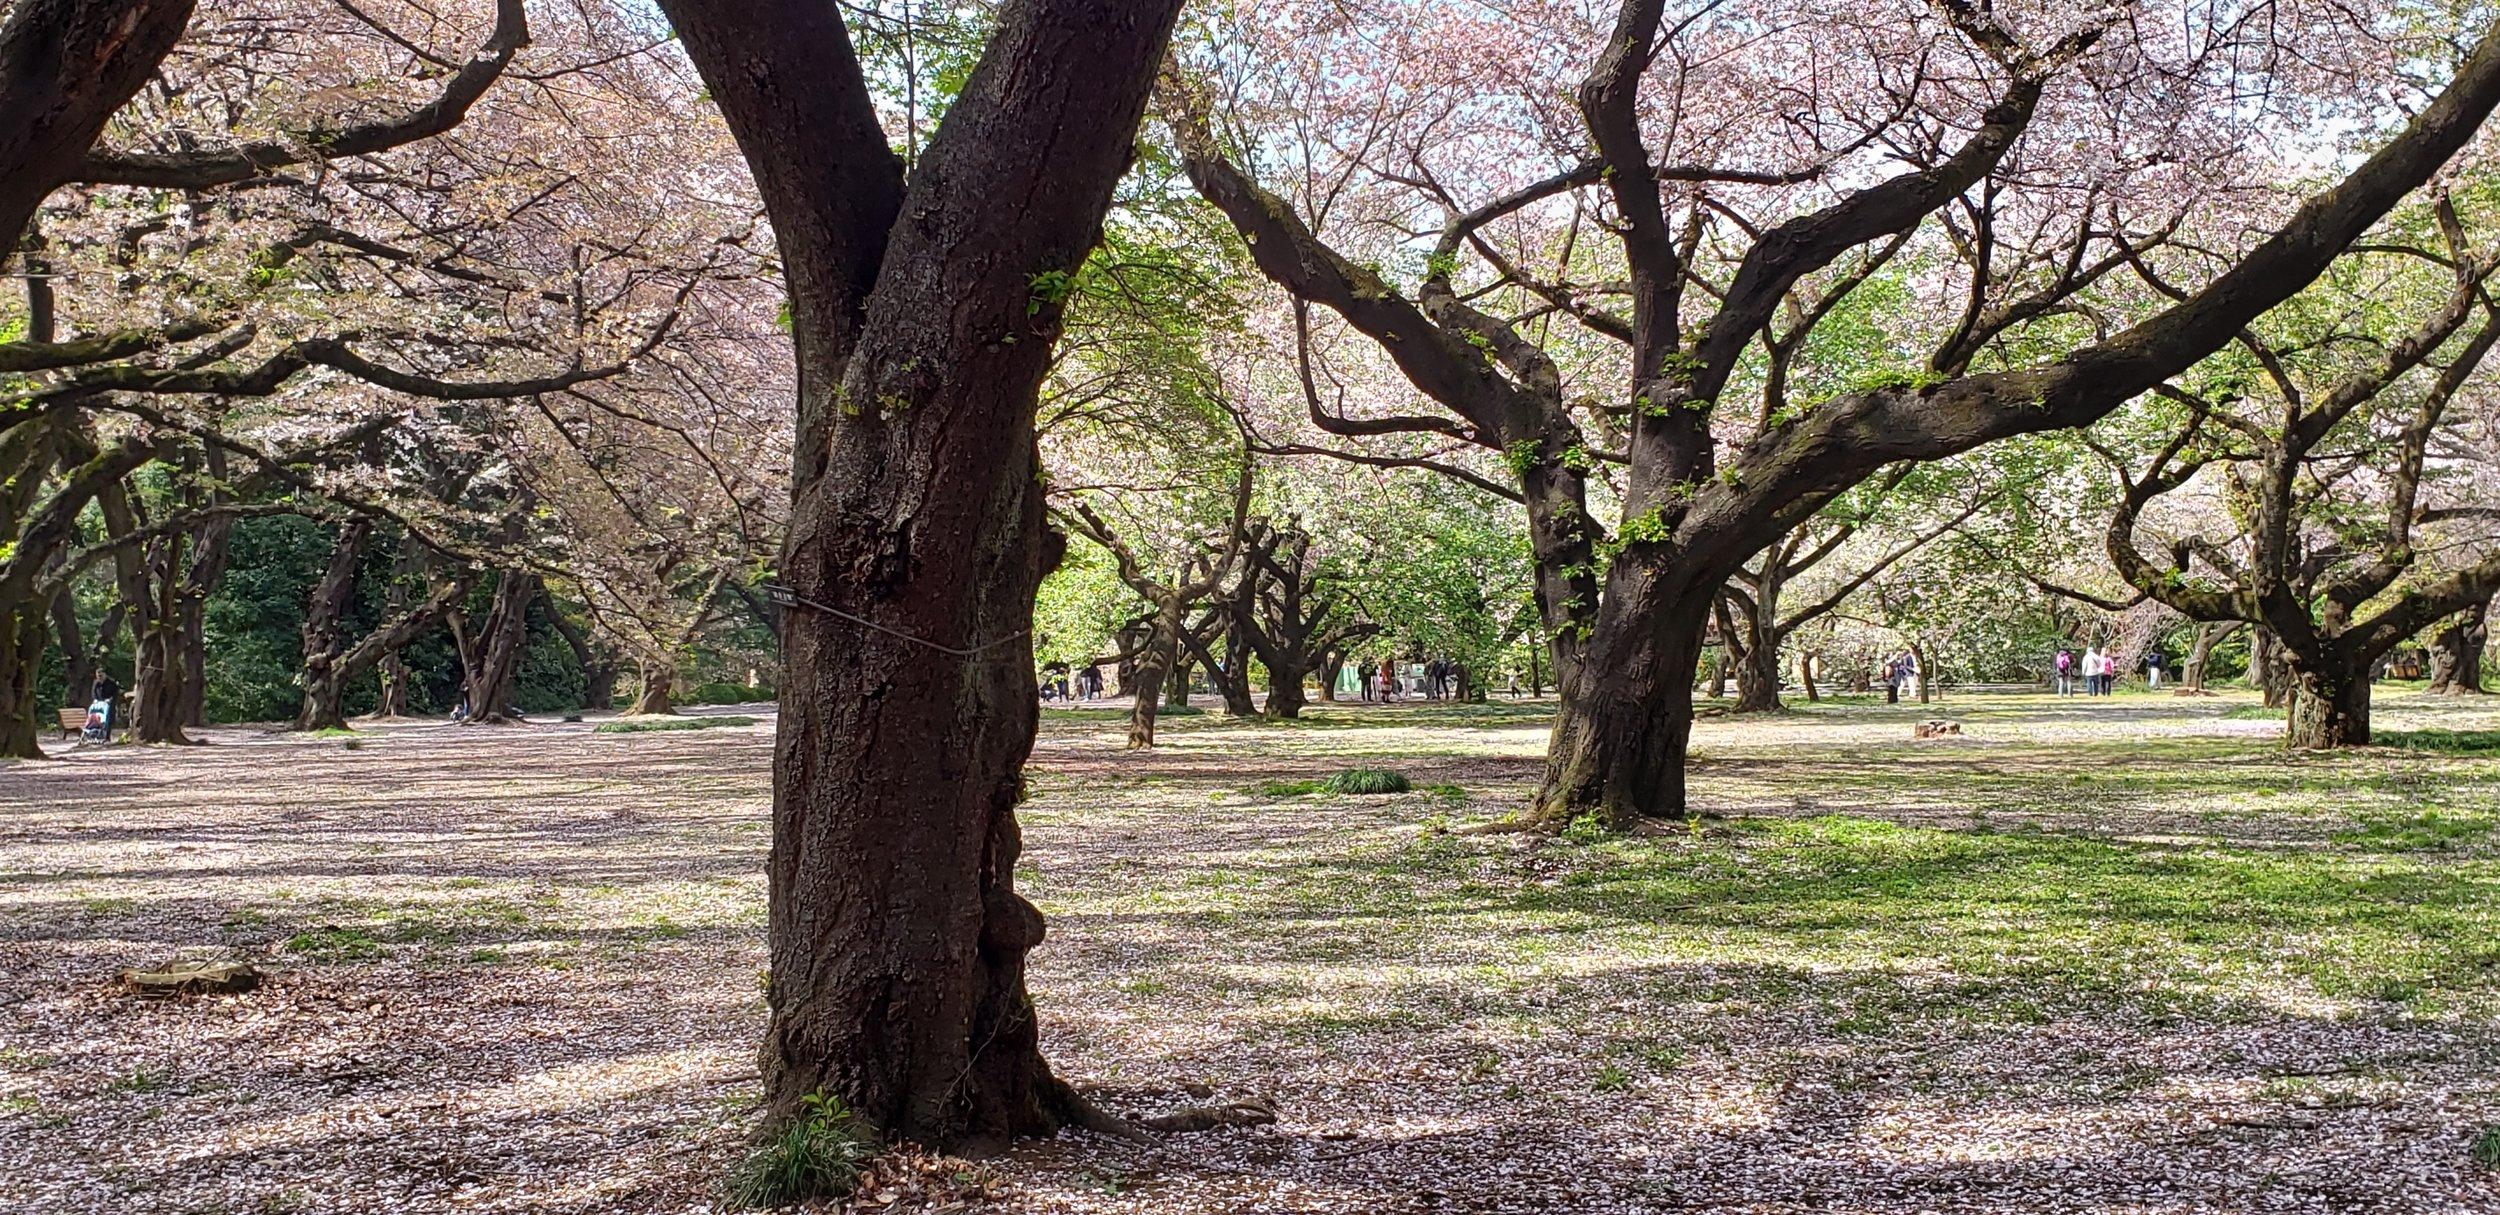 From my trip to Shinjuku Gardens, April 2019